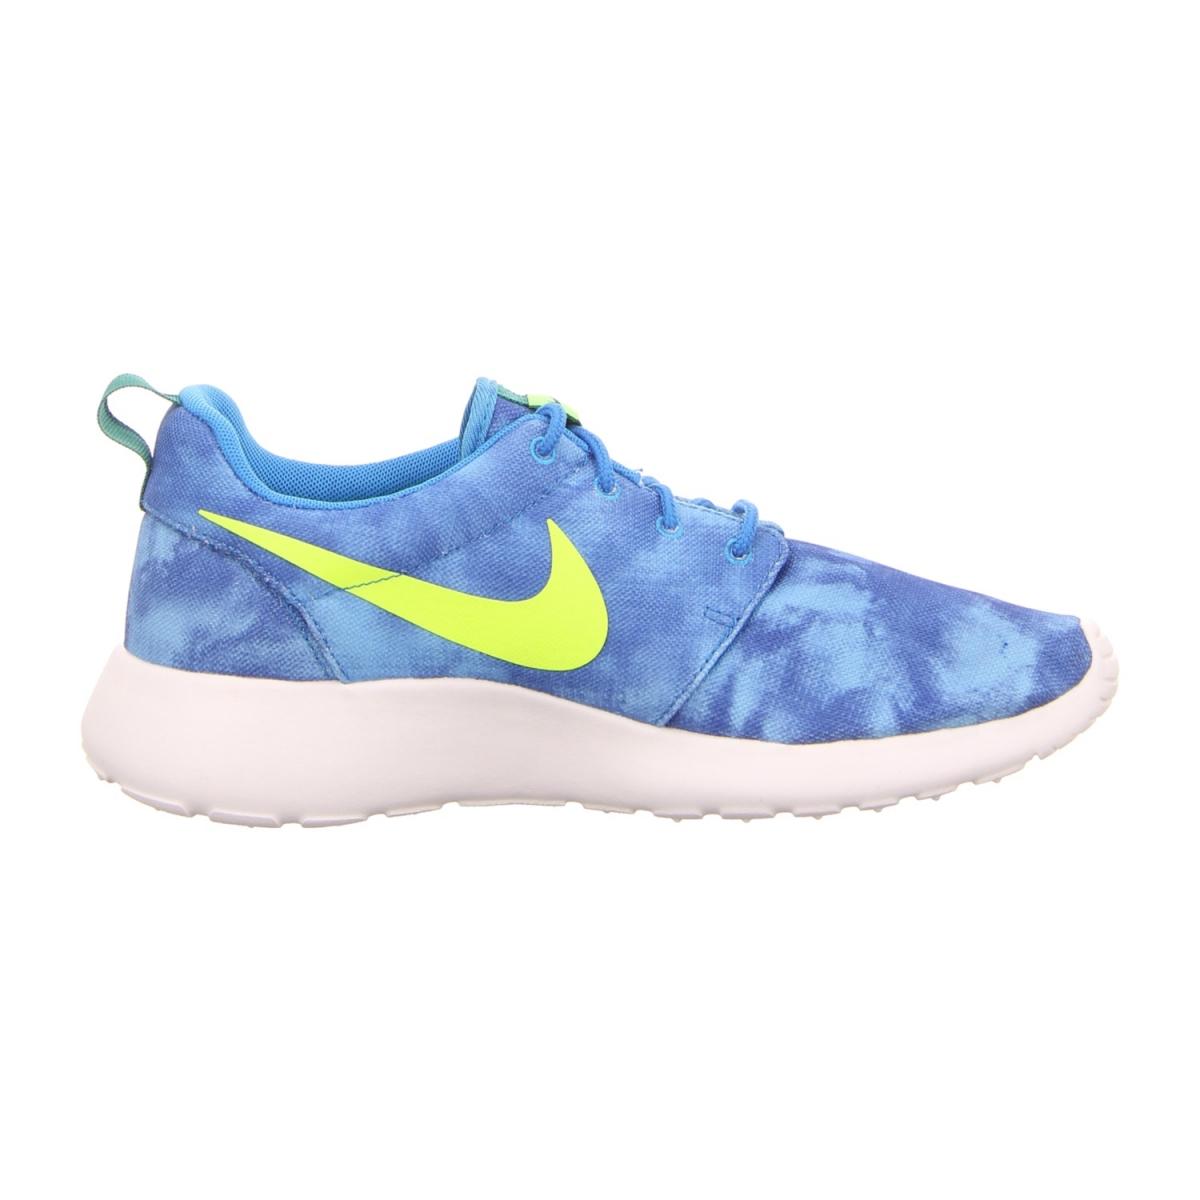 Nike rosherun print sneaker blau schuhfachmann for Schuhschrank nike